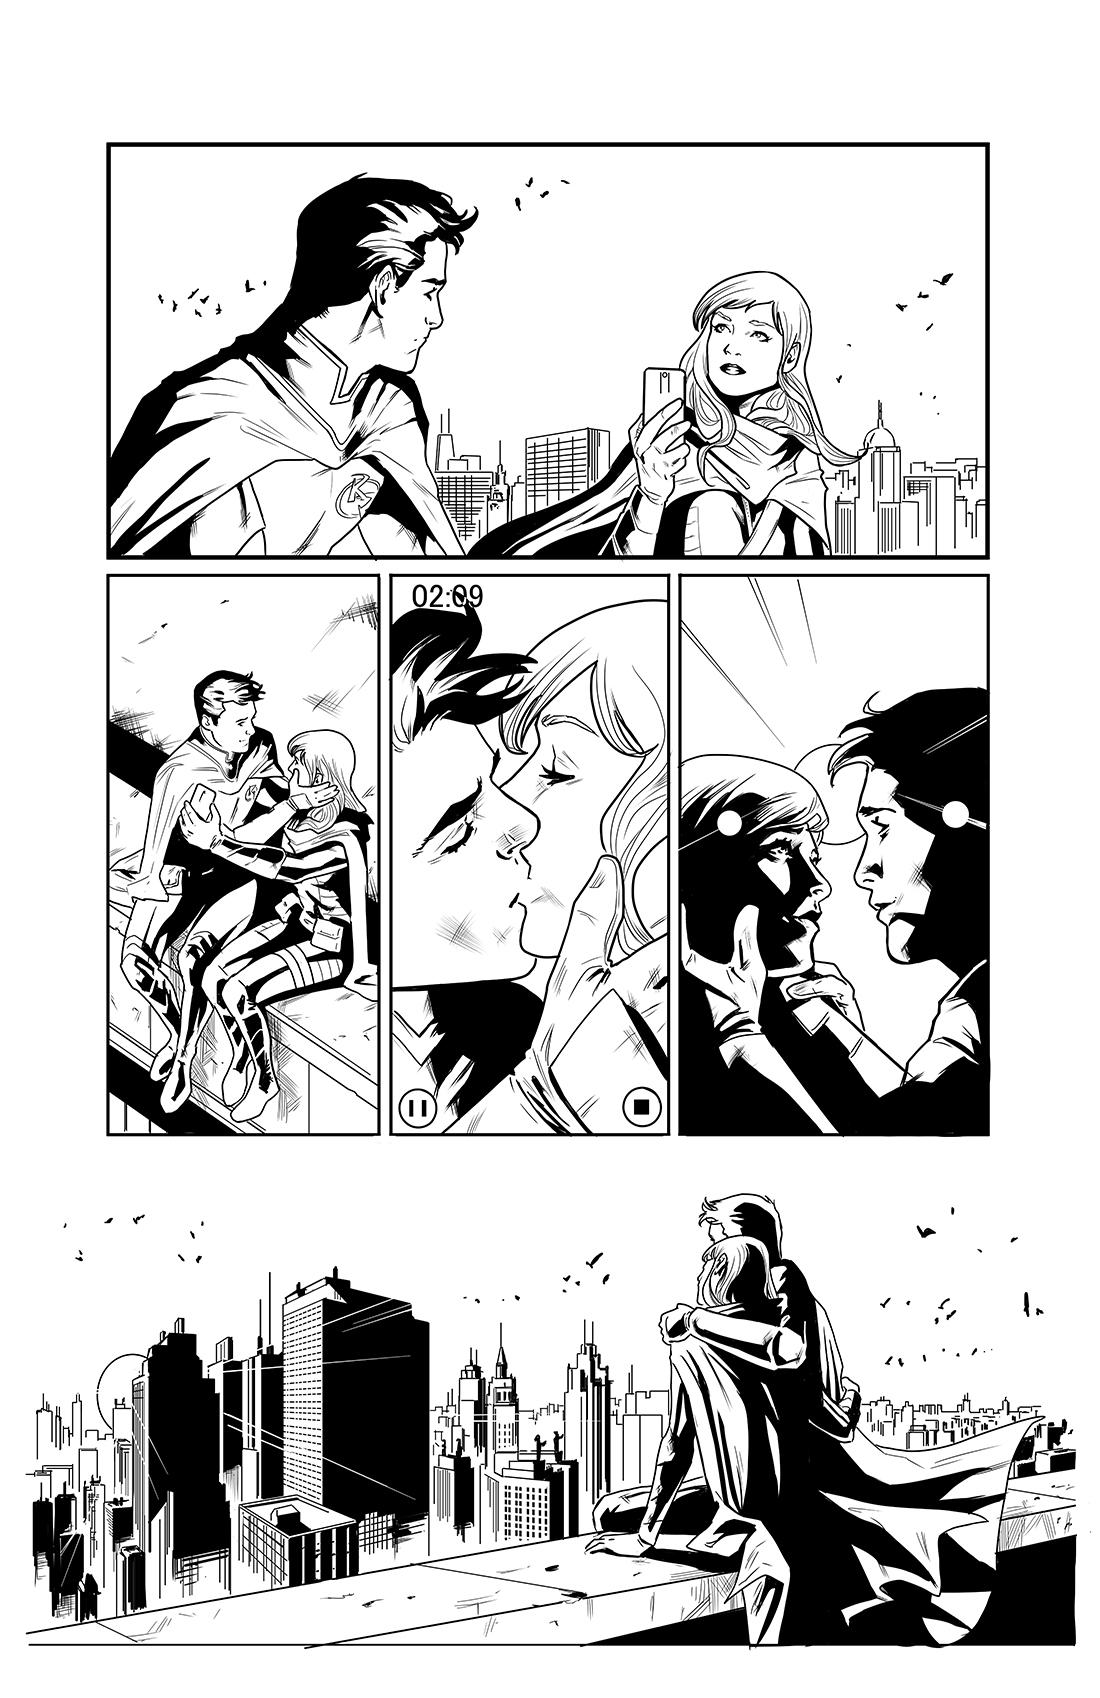 Detective Comics #963 page 3